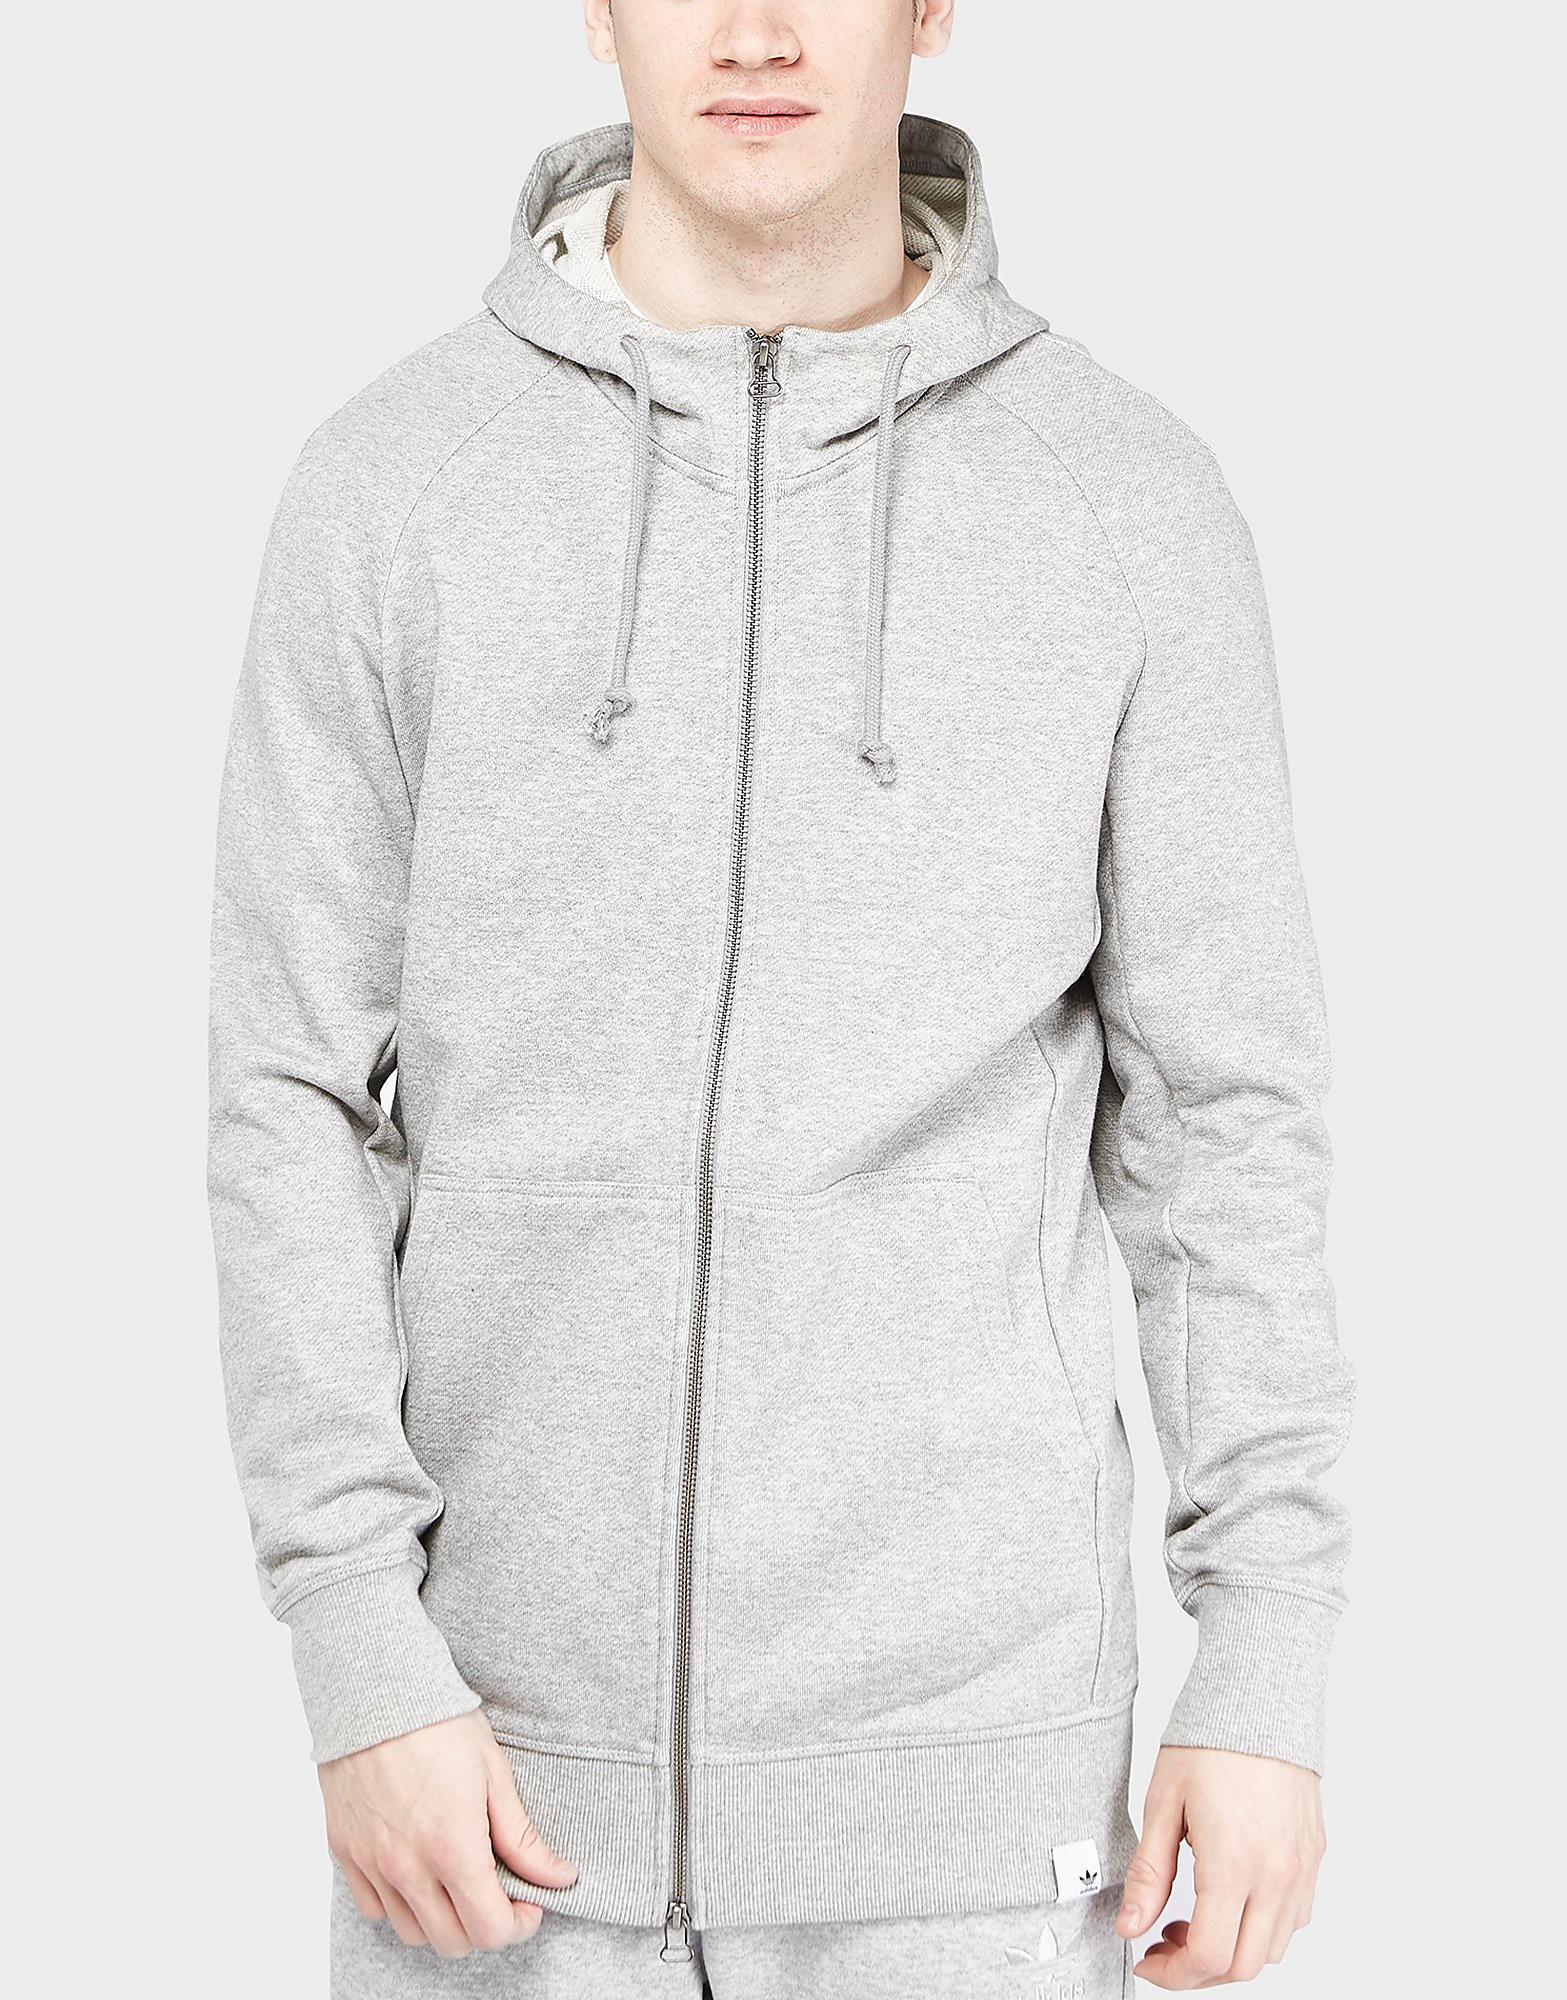 adidas Originals XBYO Full-Zip Hoody